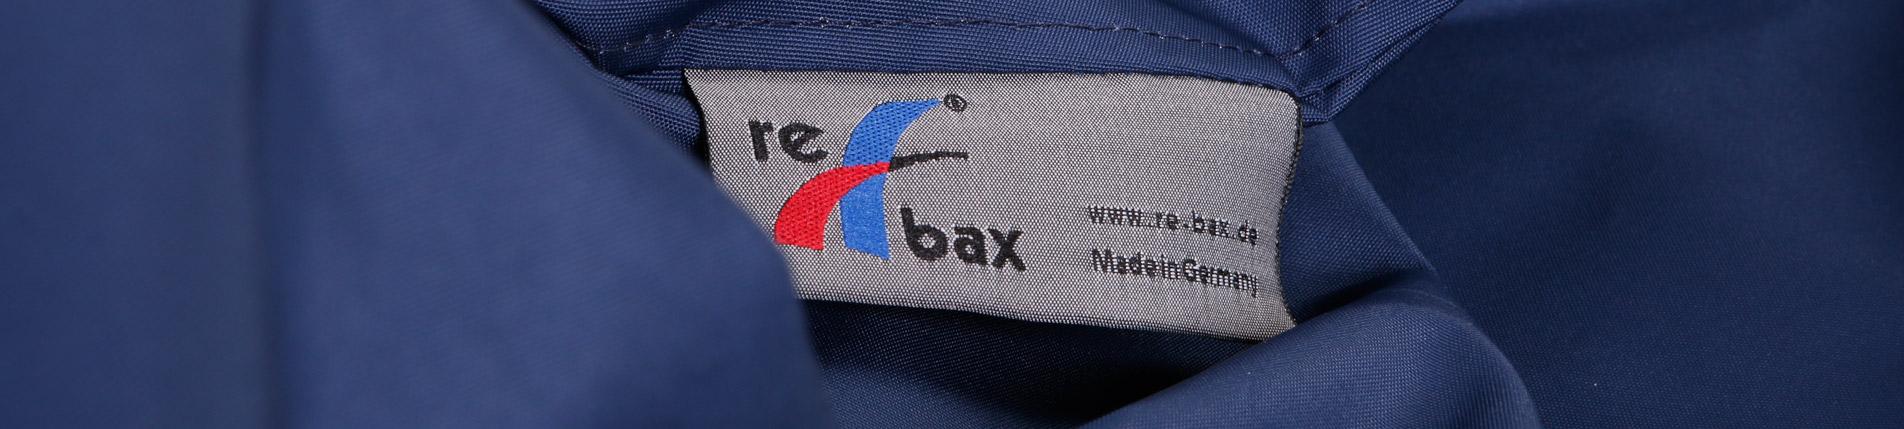 re-bax